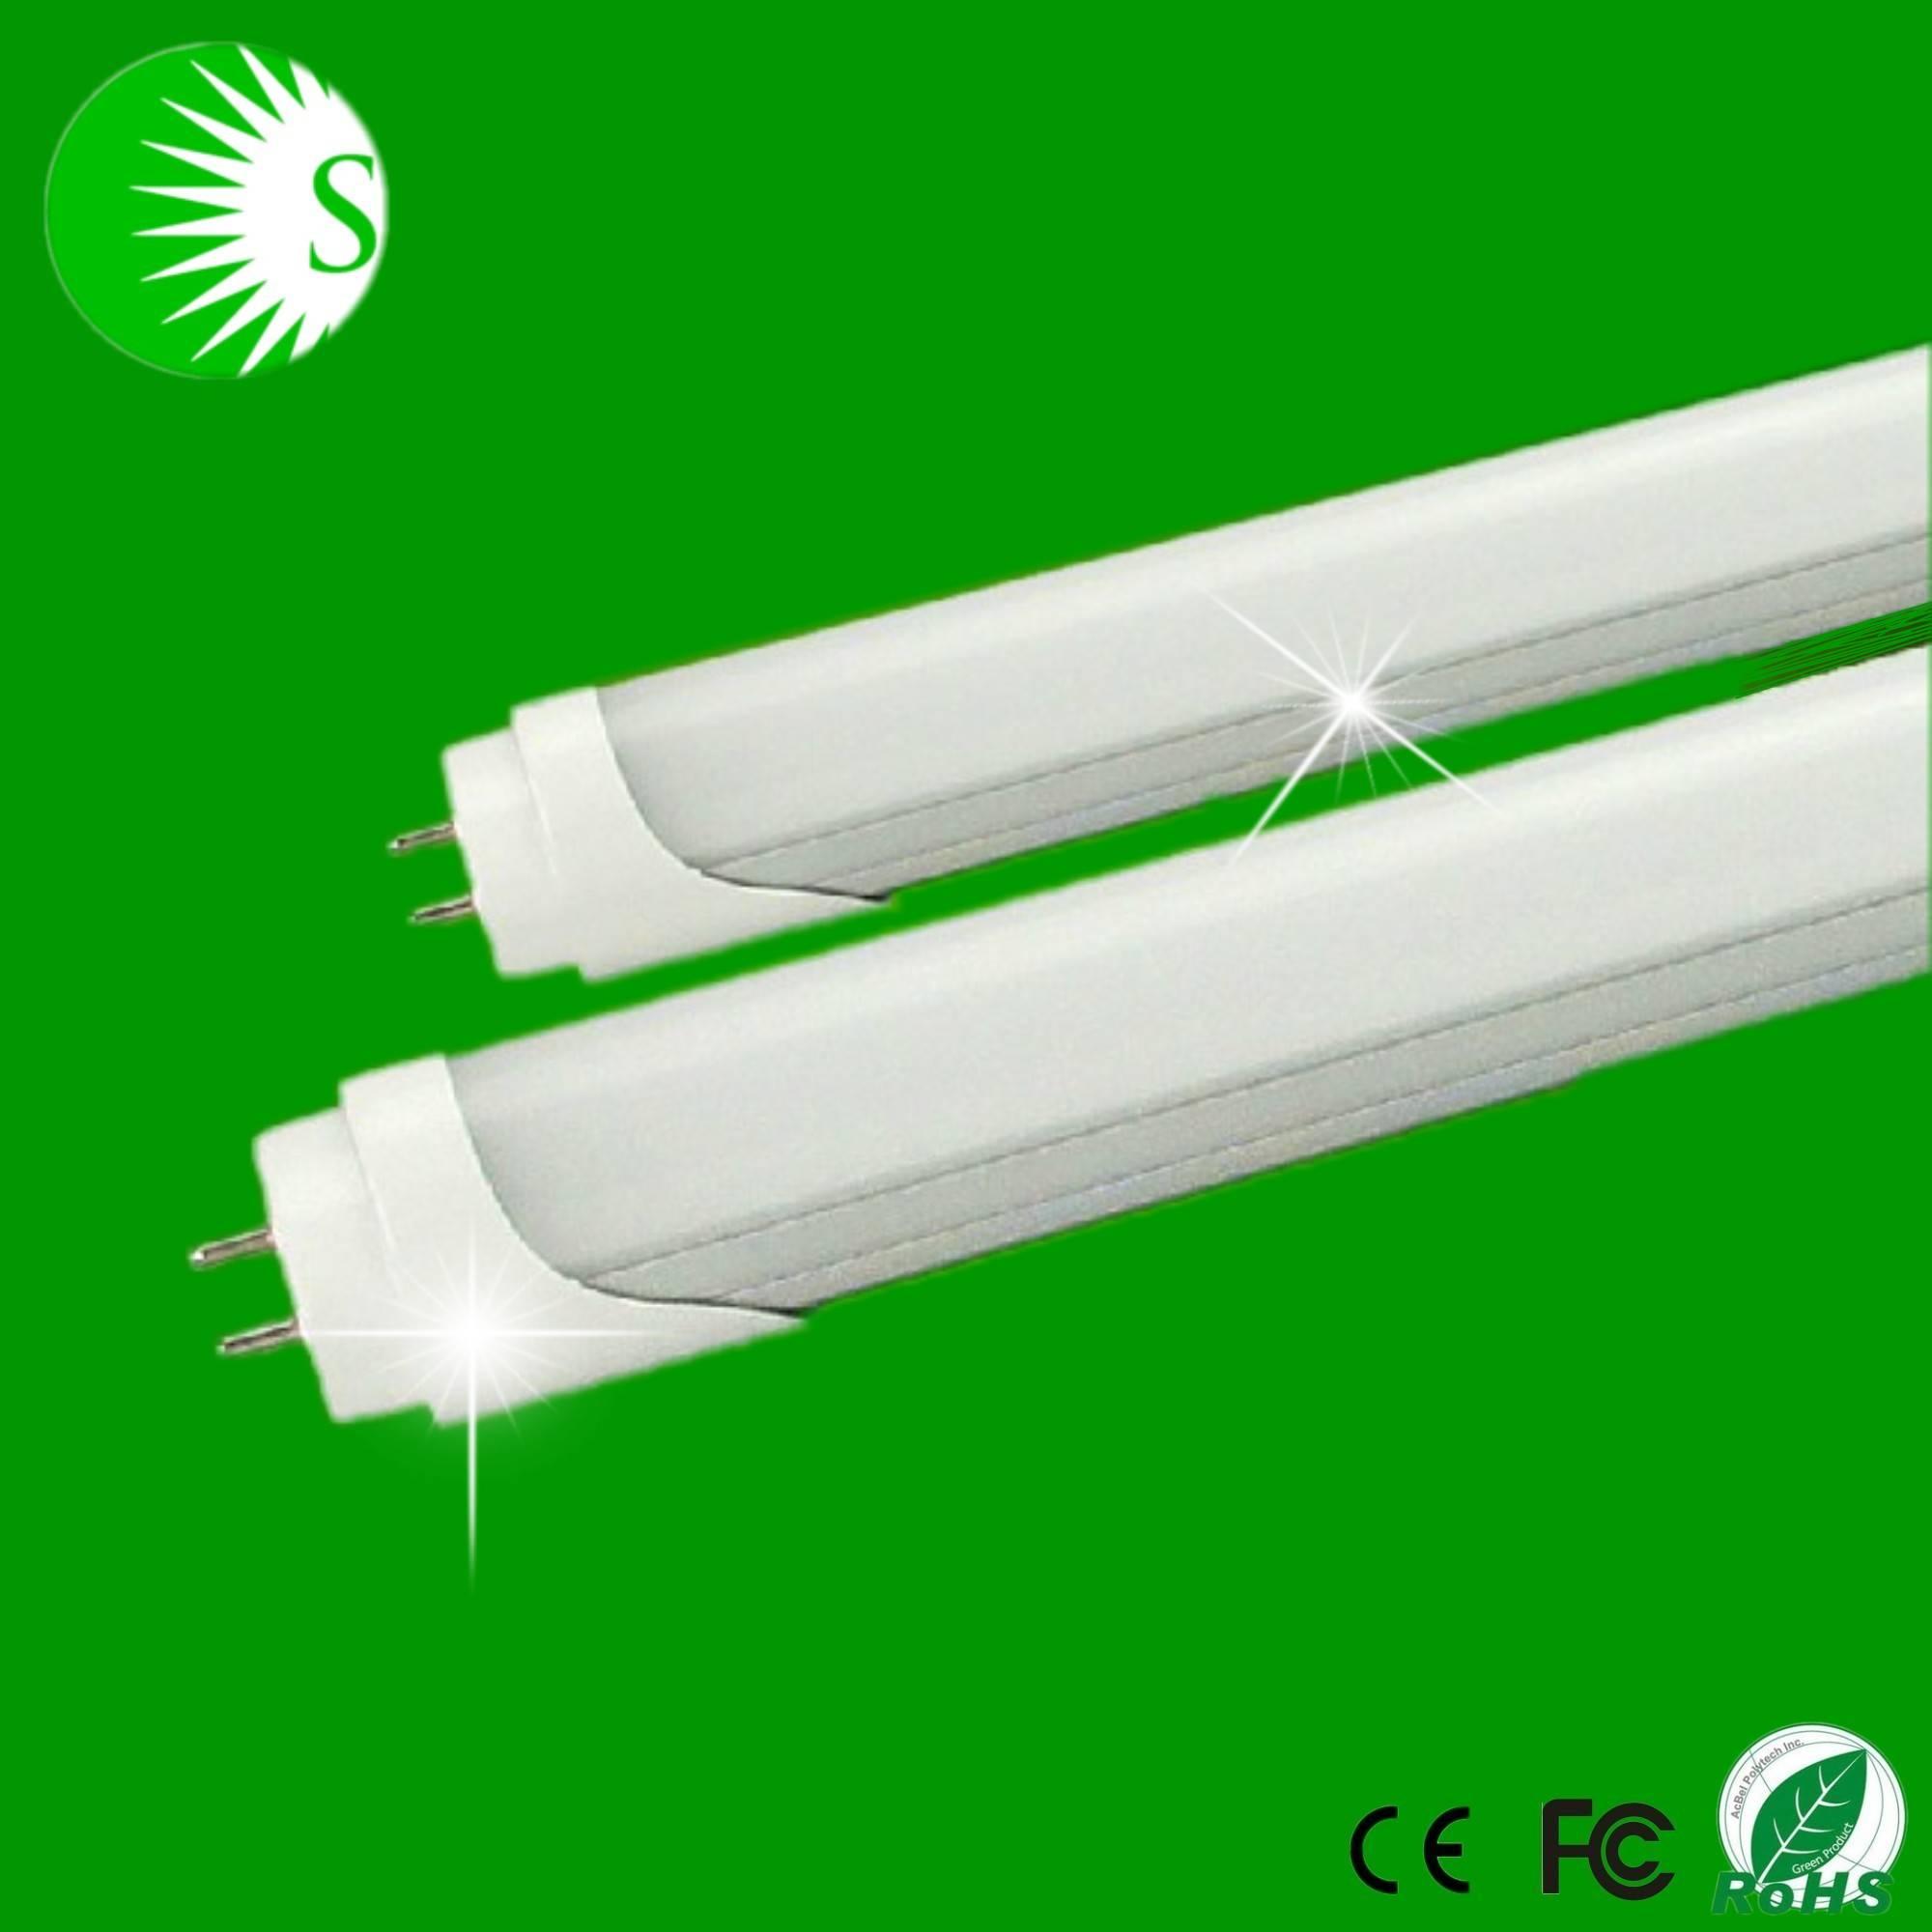 0.6m 0.9m 1.2m 1.5m tube light wide voltage AC85-265V CRI80 Epister led SMD2835 behigh quaity tube